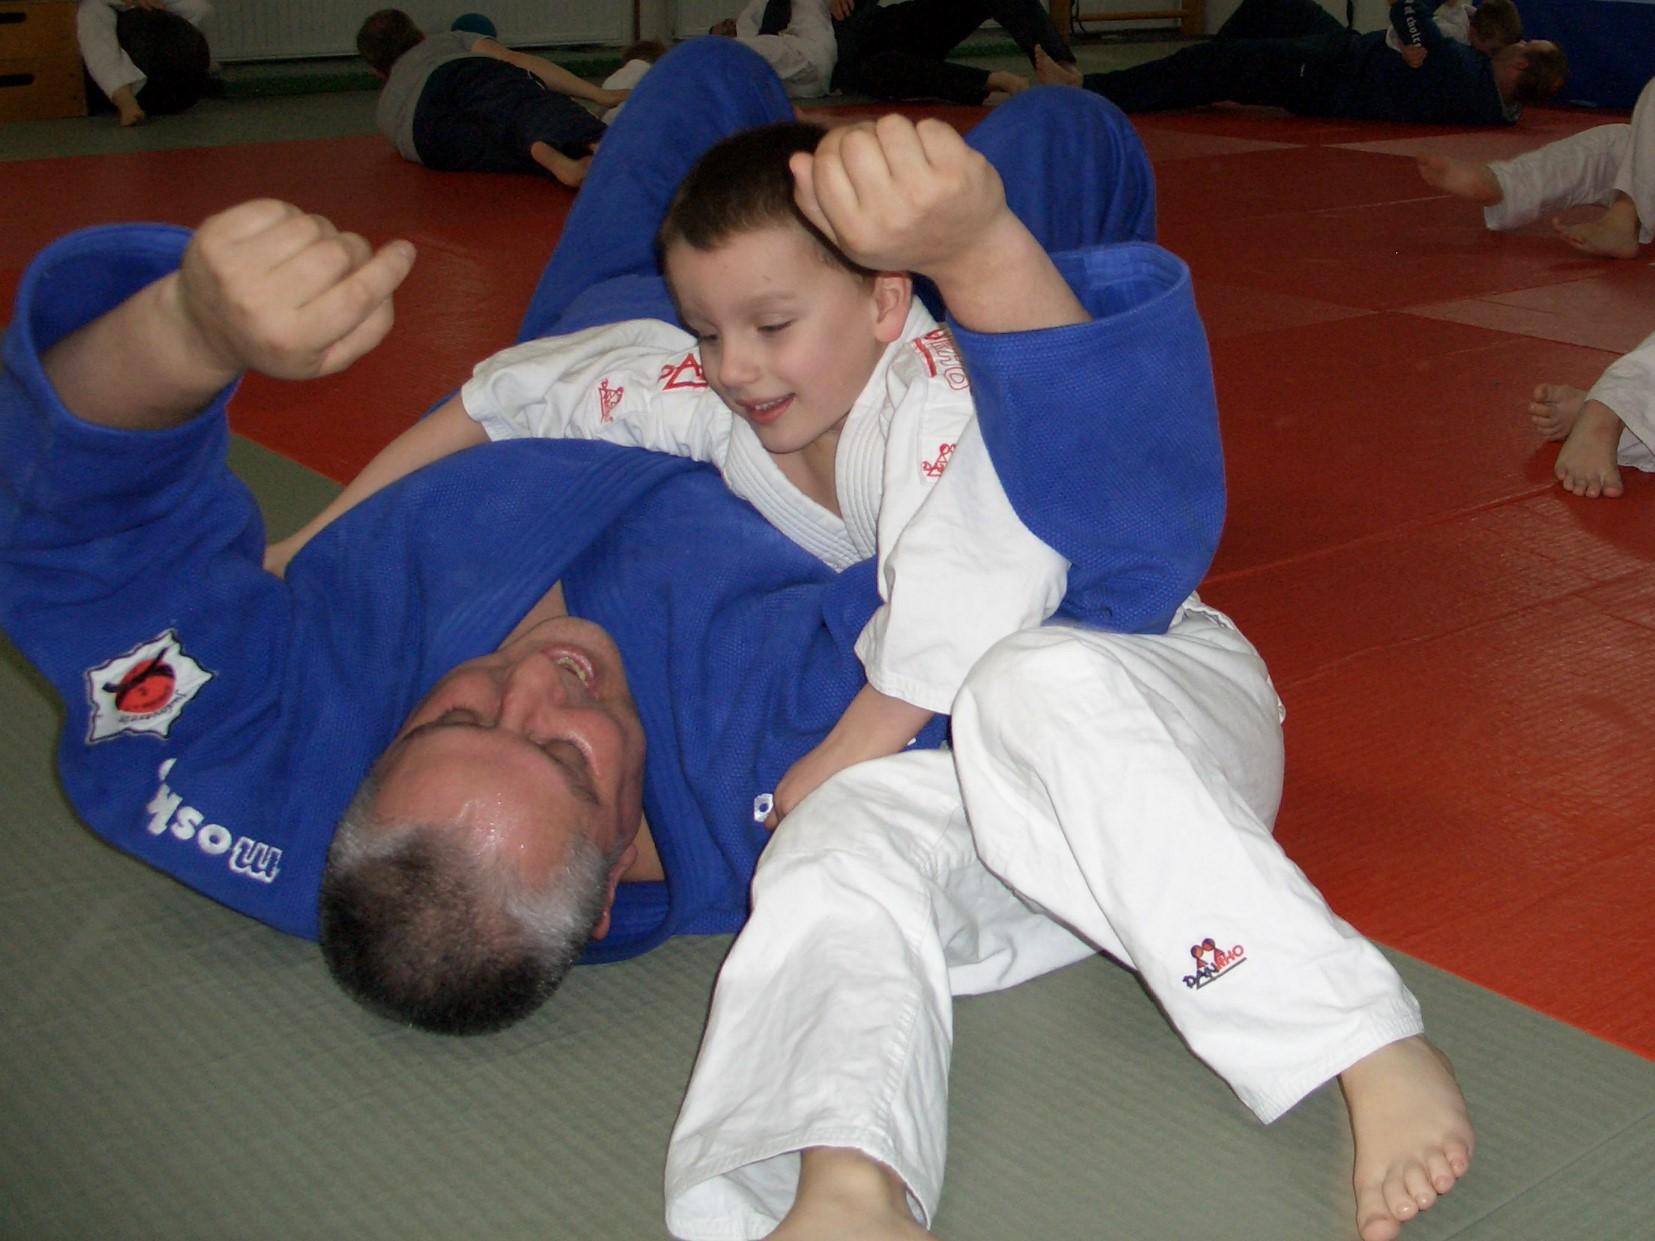 André Hüller trainiert Judo mit Sohn Chris Hüller